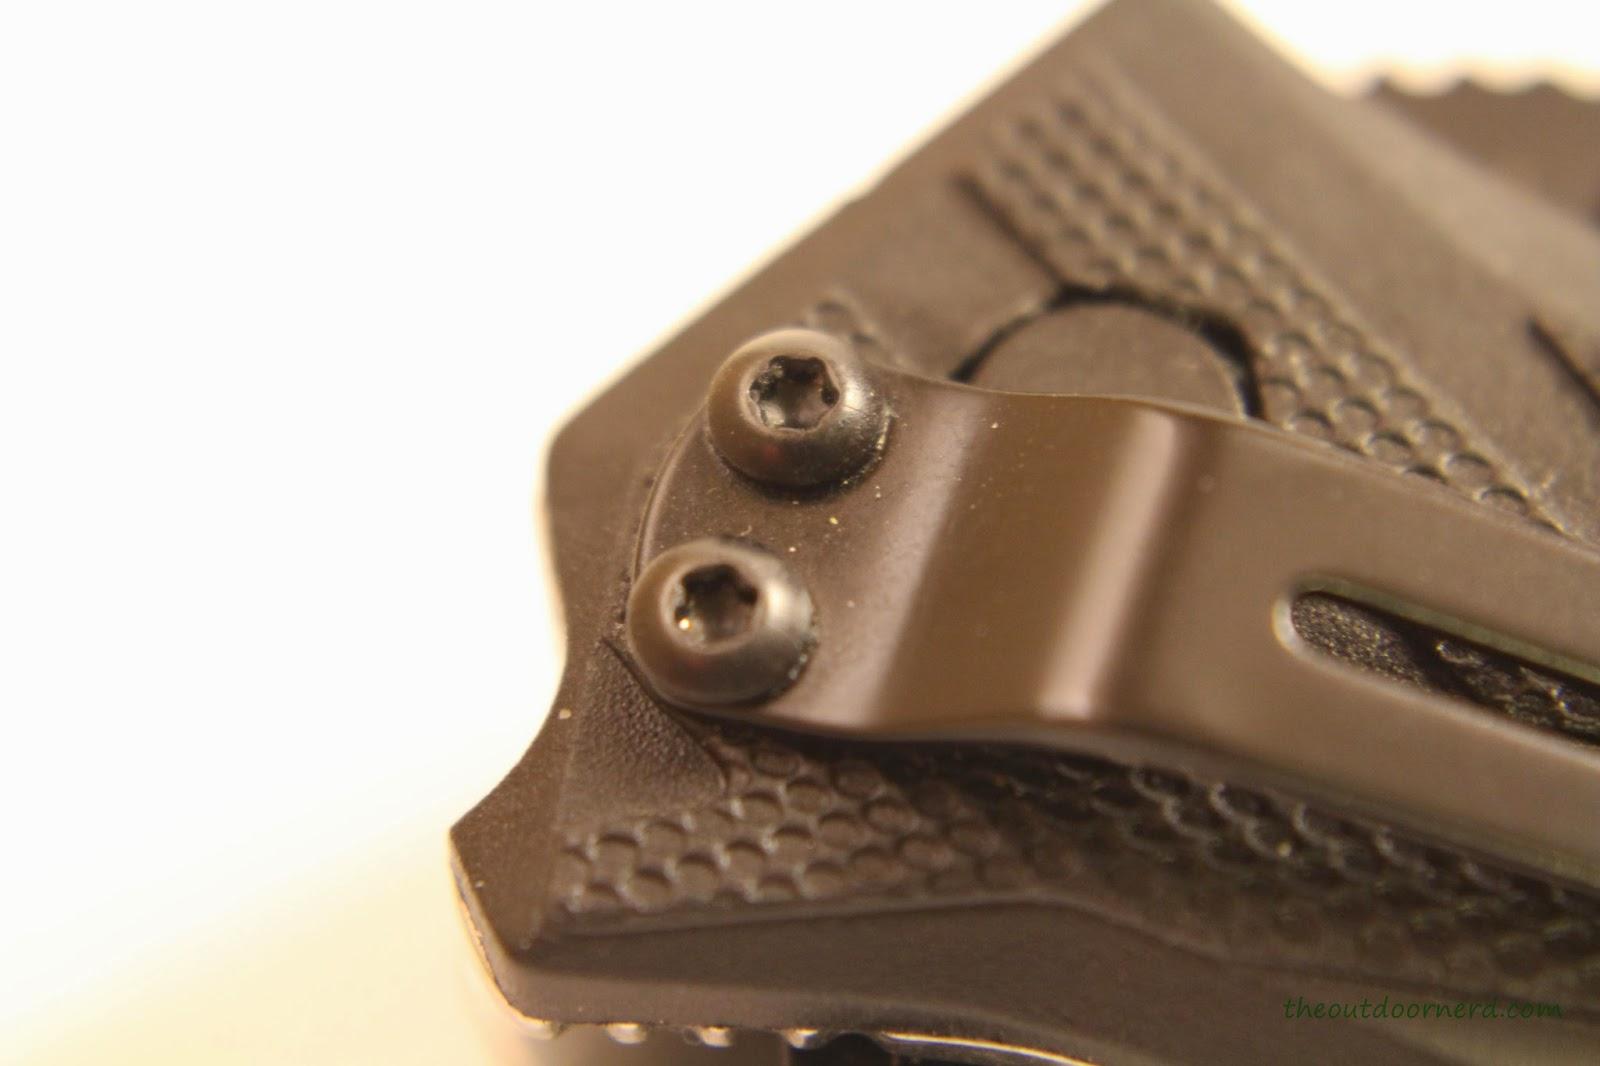 Kershaw Brawler Pocket Knife Close Up Of Clip 2